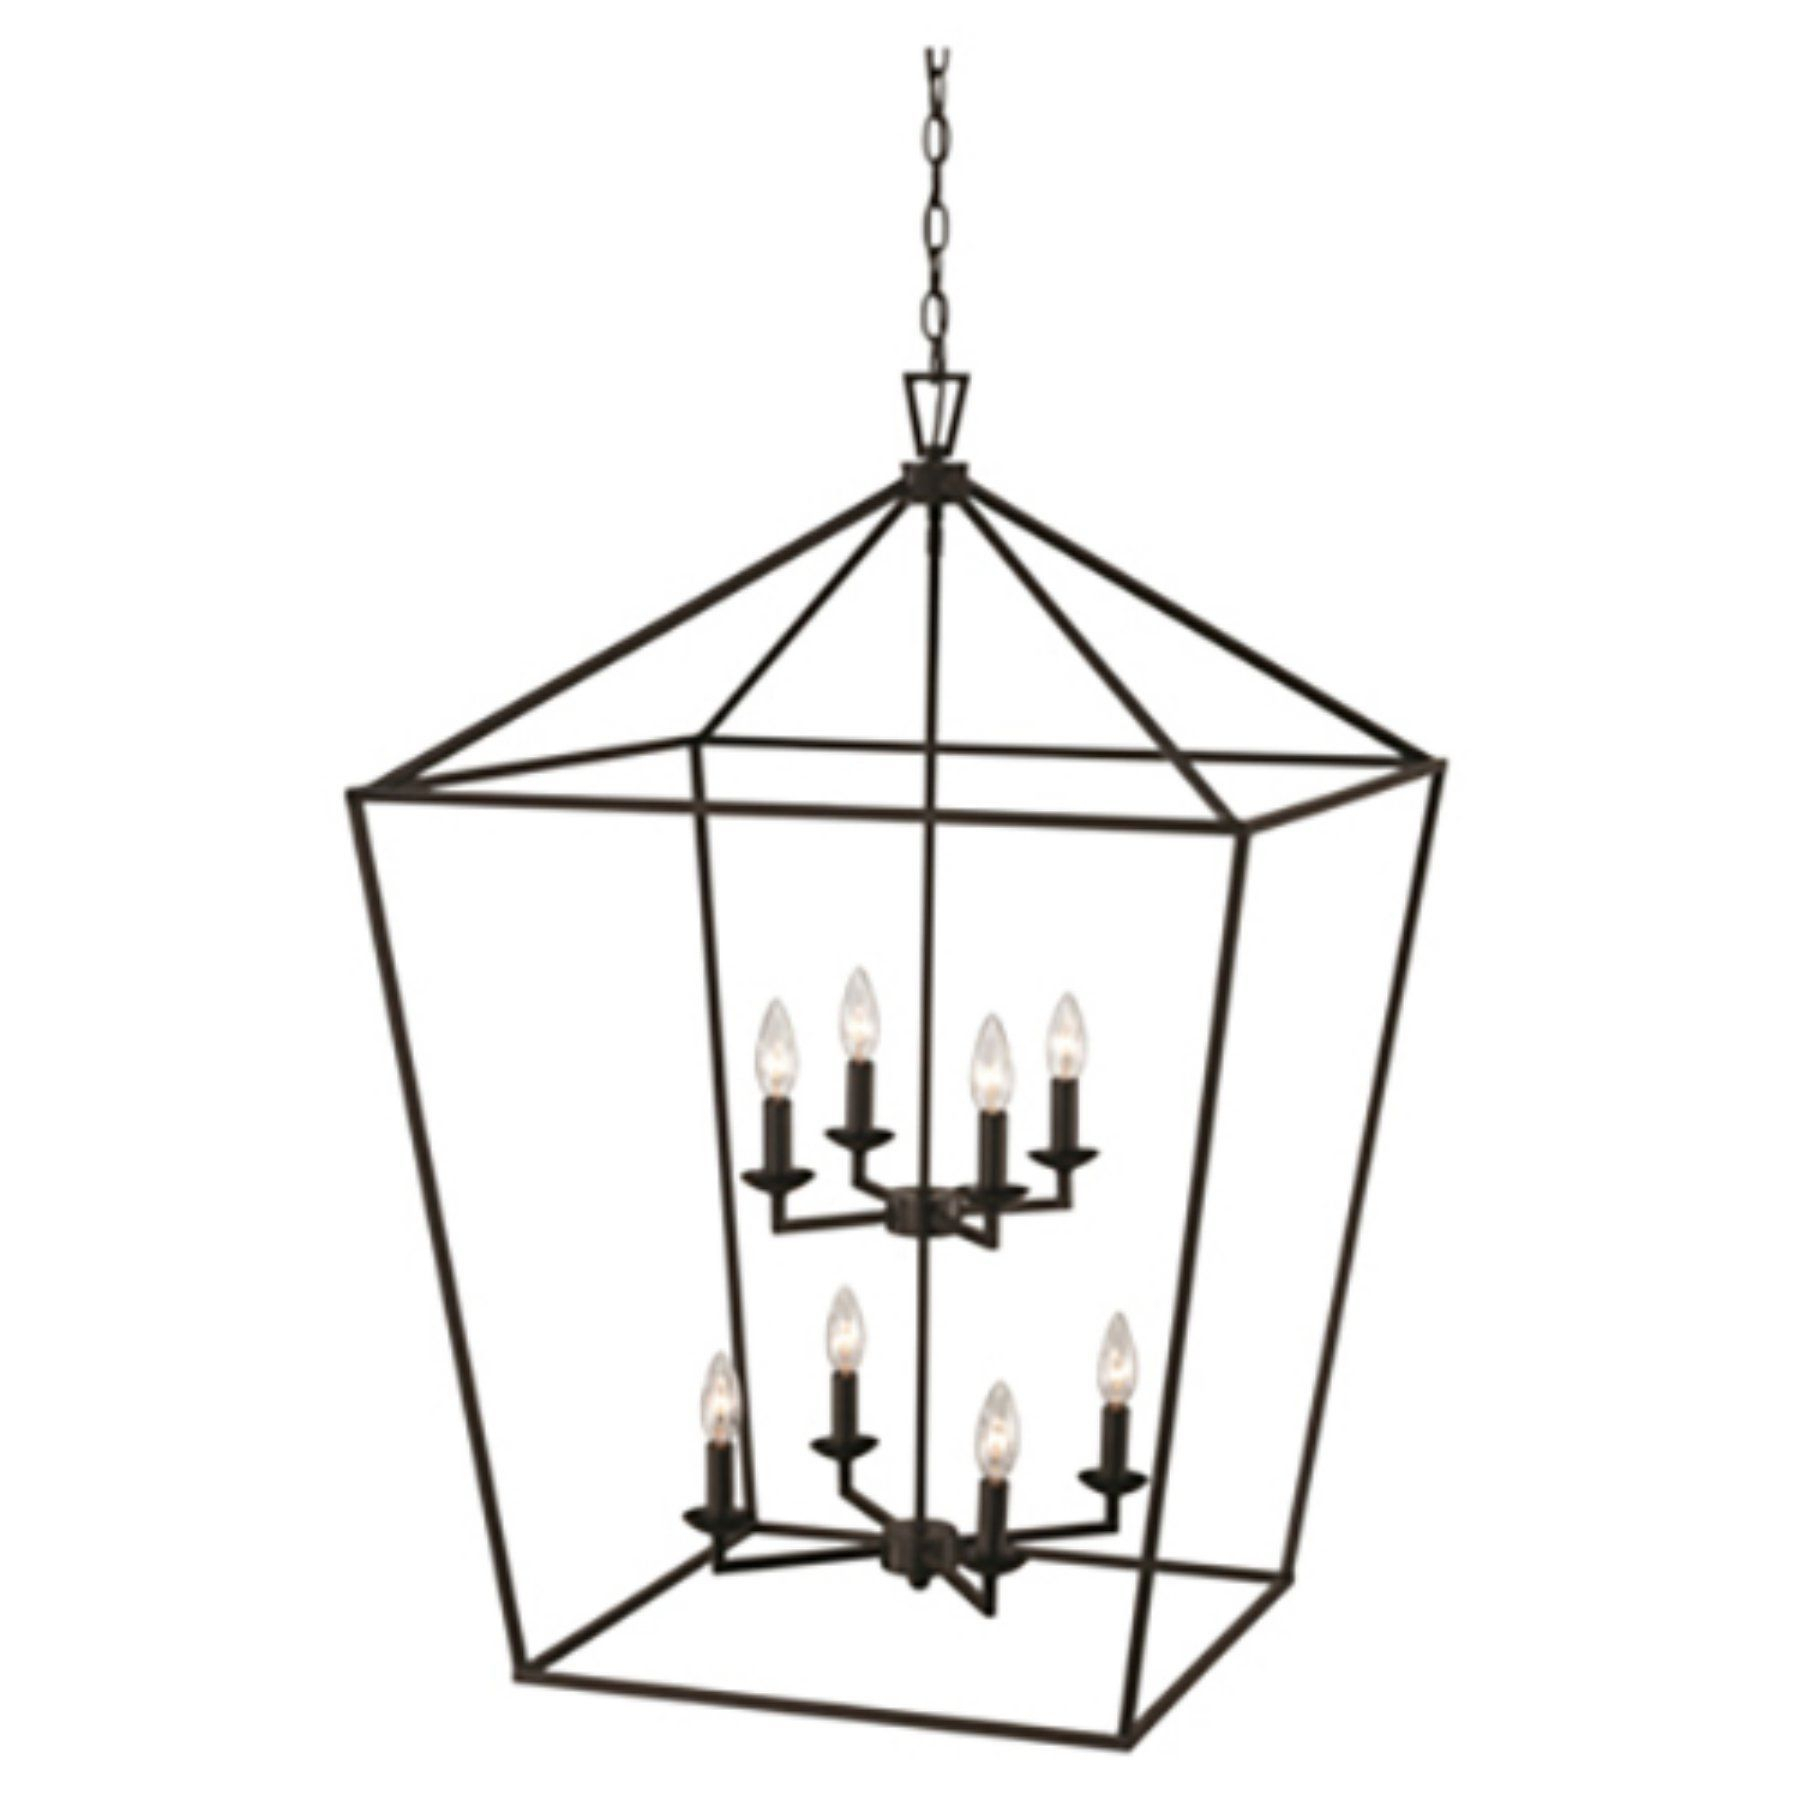 Trans Globe Lighting Lacey 10269 Pendant Light - 10269 Rob throughout Carmen 8-Light Lantern Tiered Pendants (Image 28 of 30)